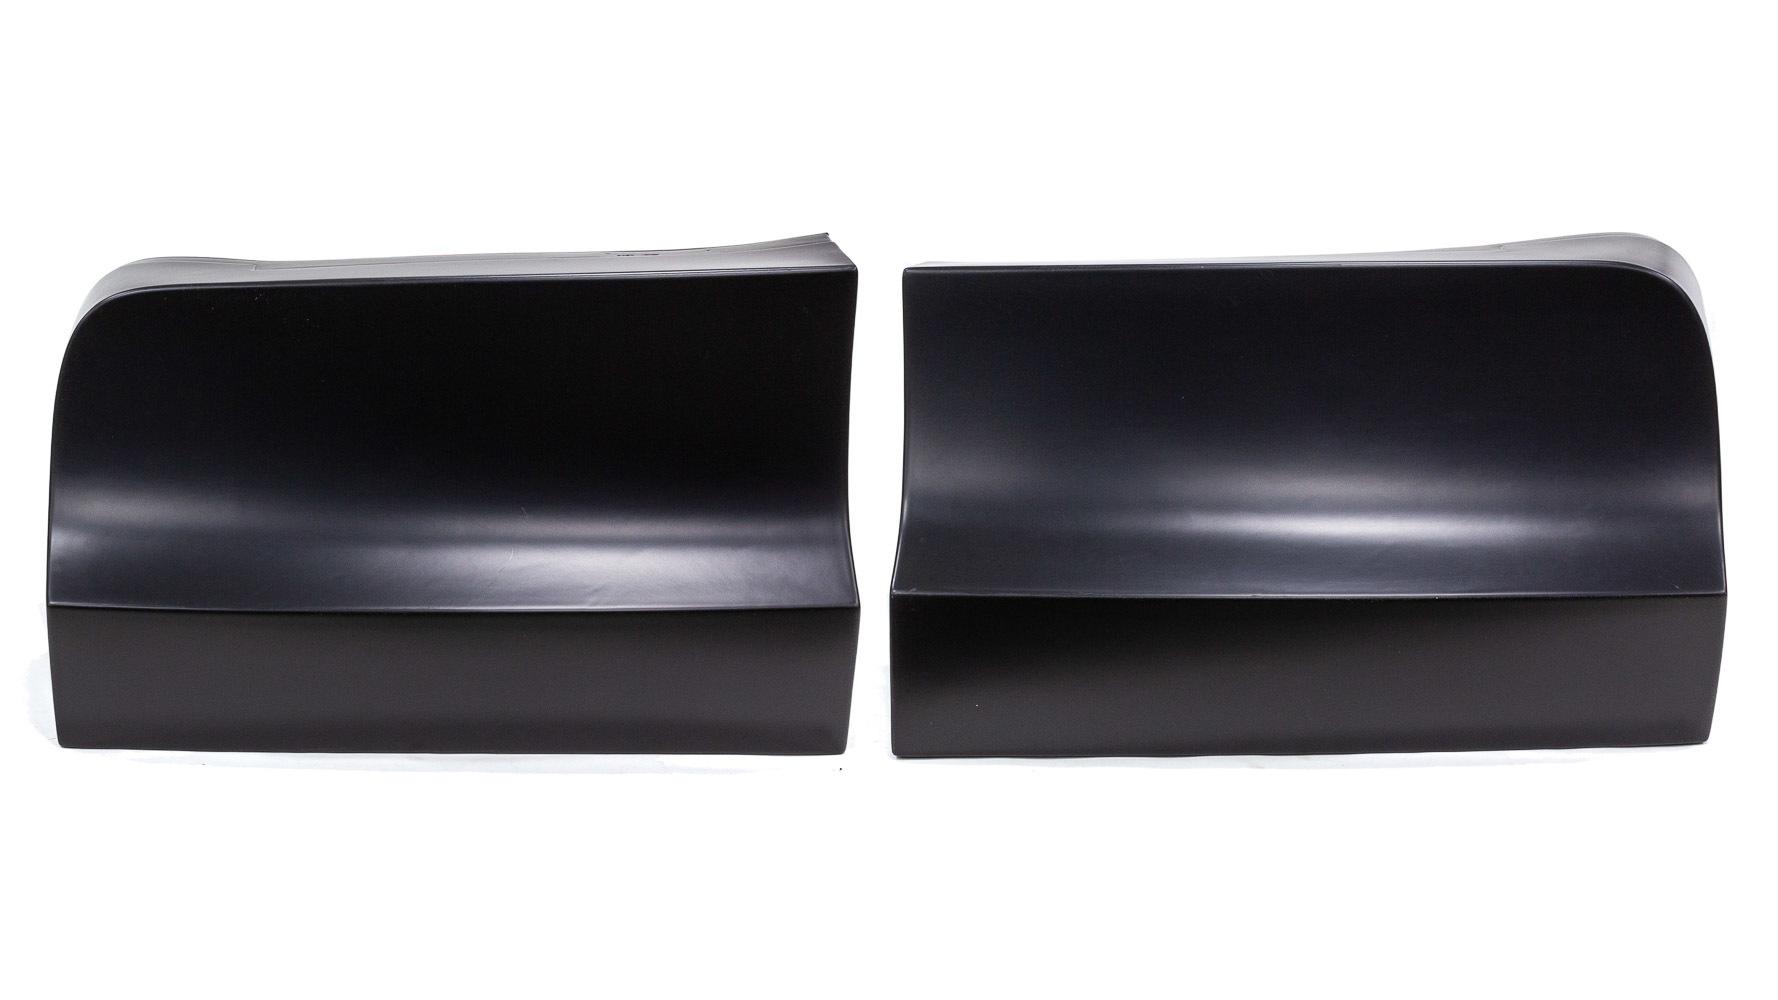 Fivestar ABC Rear Bumper Cover Plastic Black